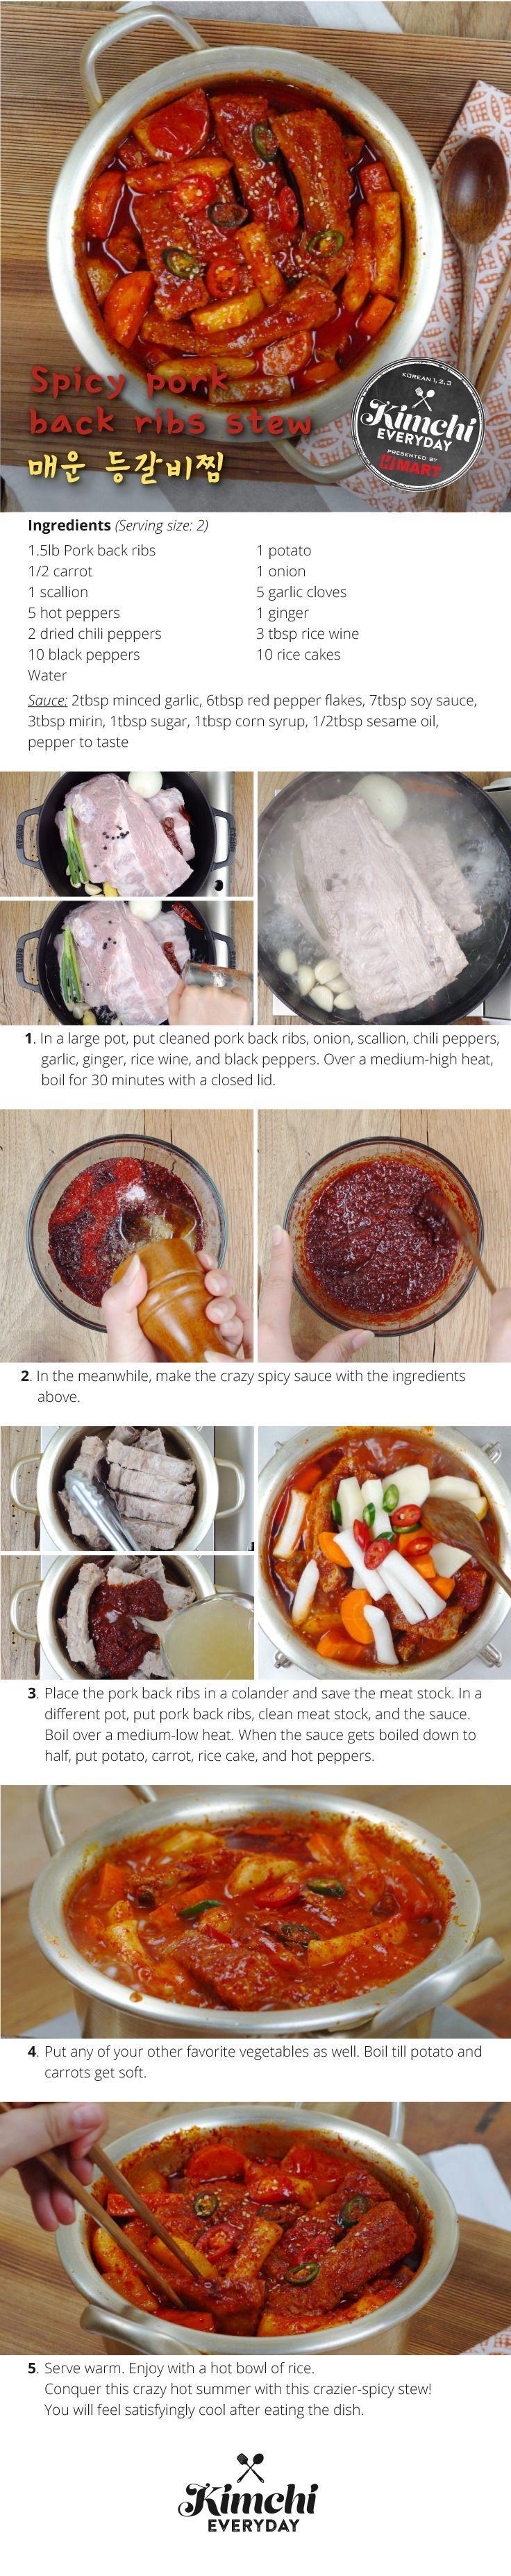 Spicy Korean Pork Back Ribs Stew